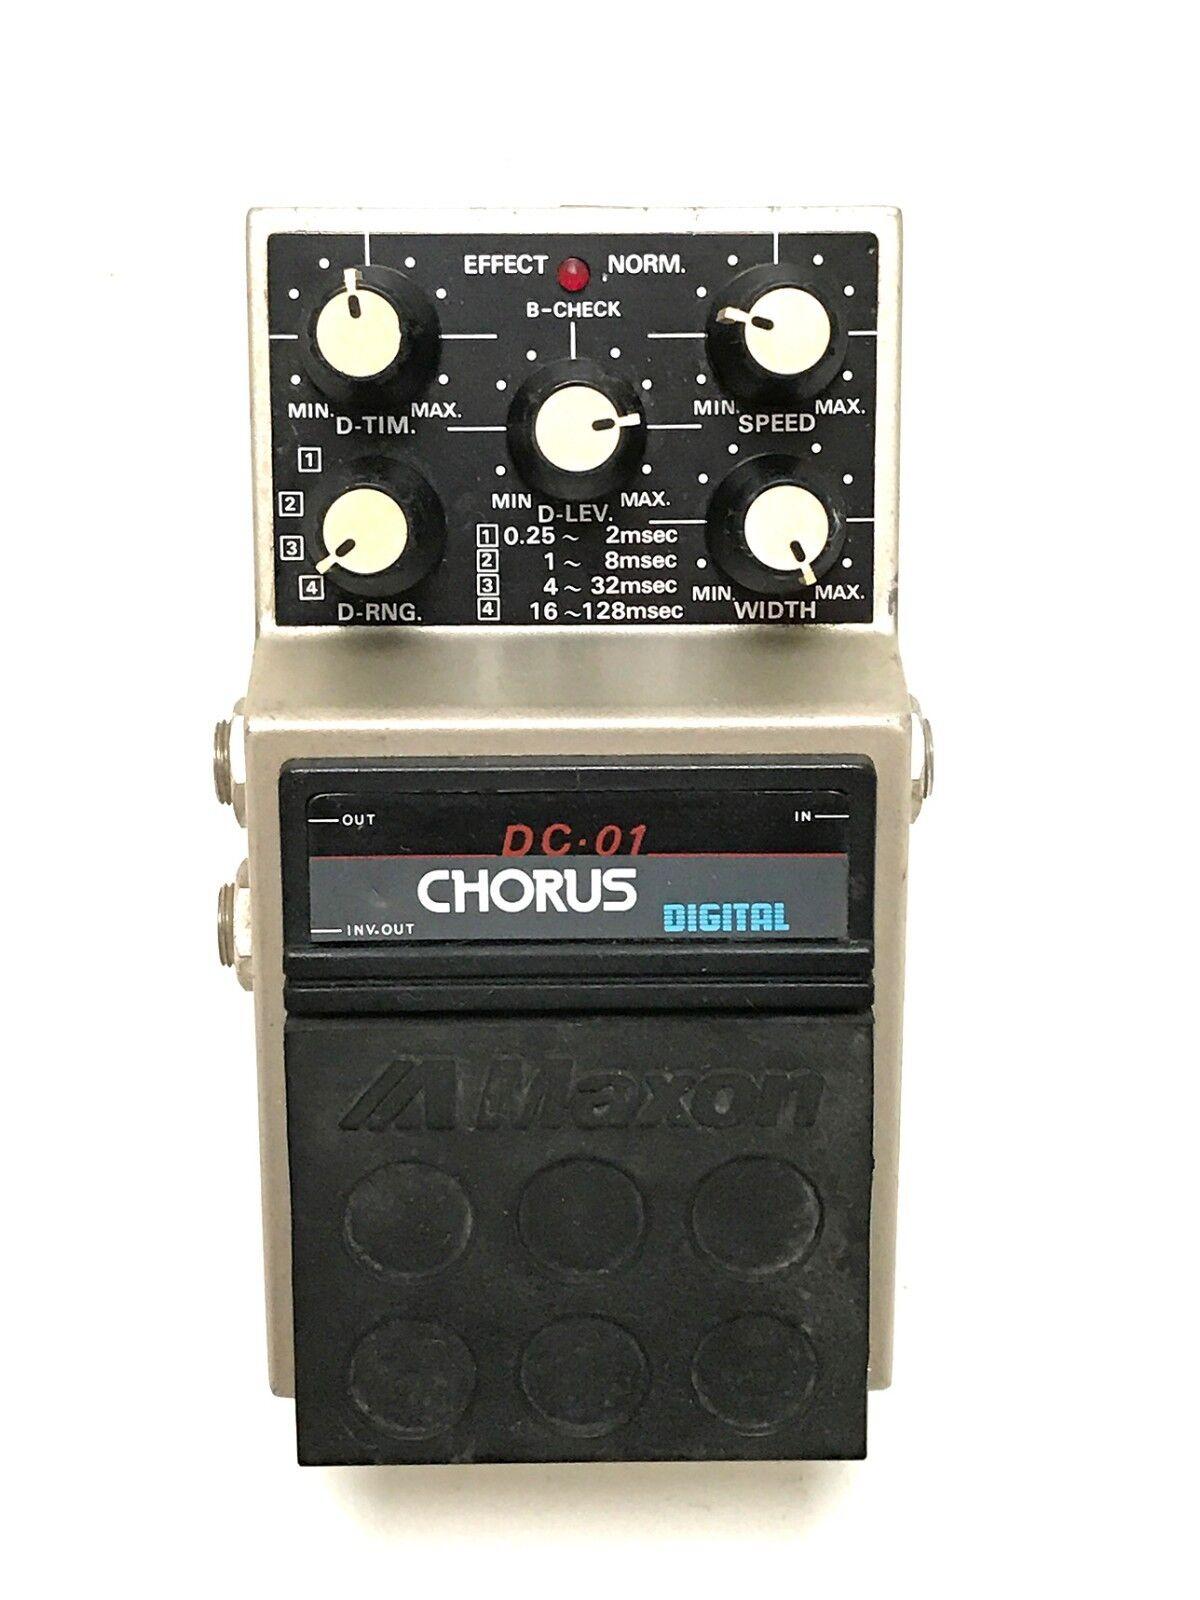 Maxon DC-01 Digital Chorus Made In Japan, 1980's